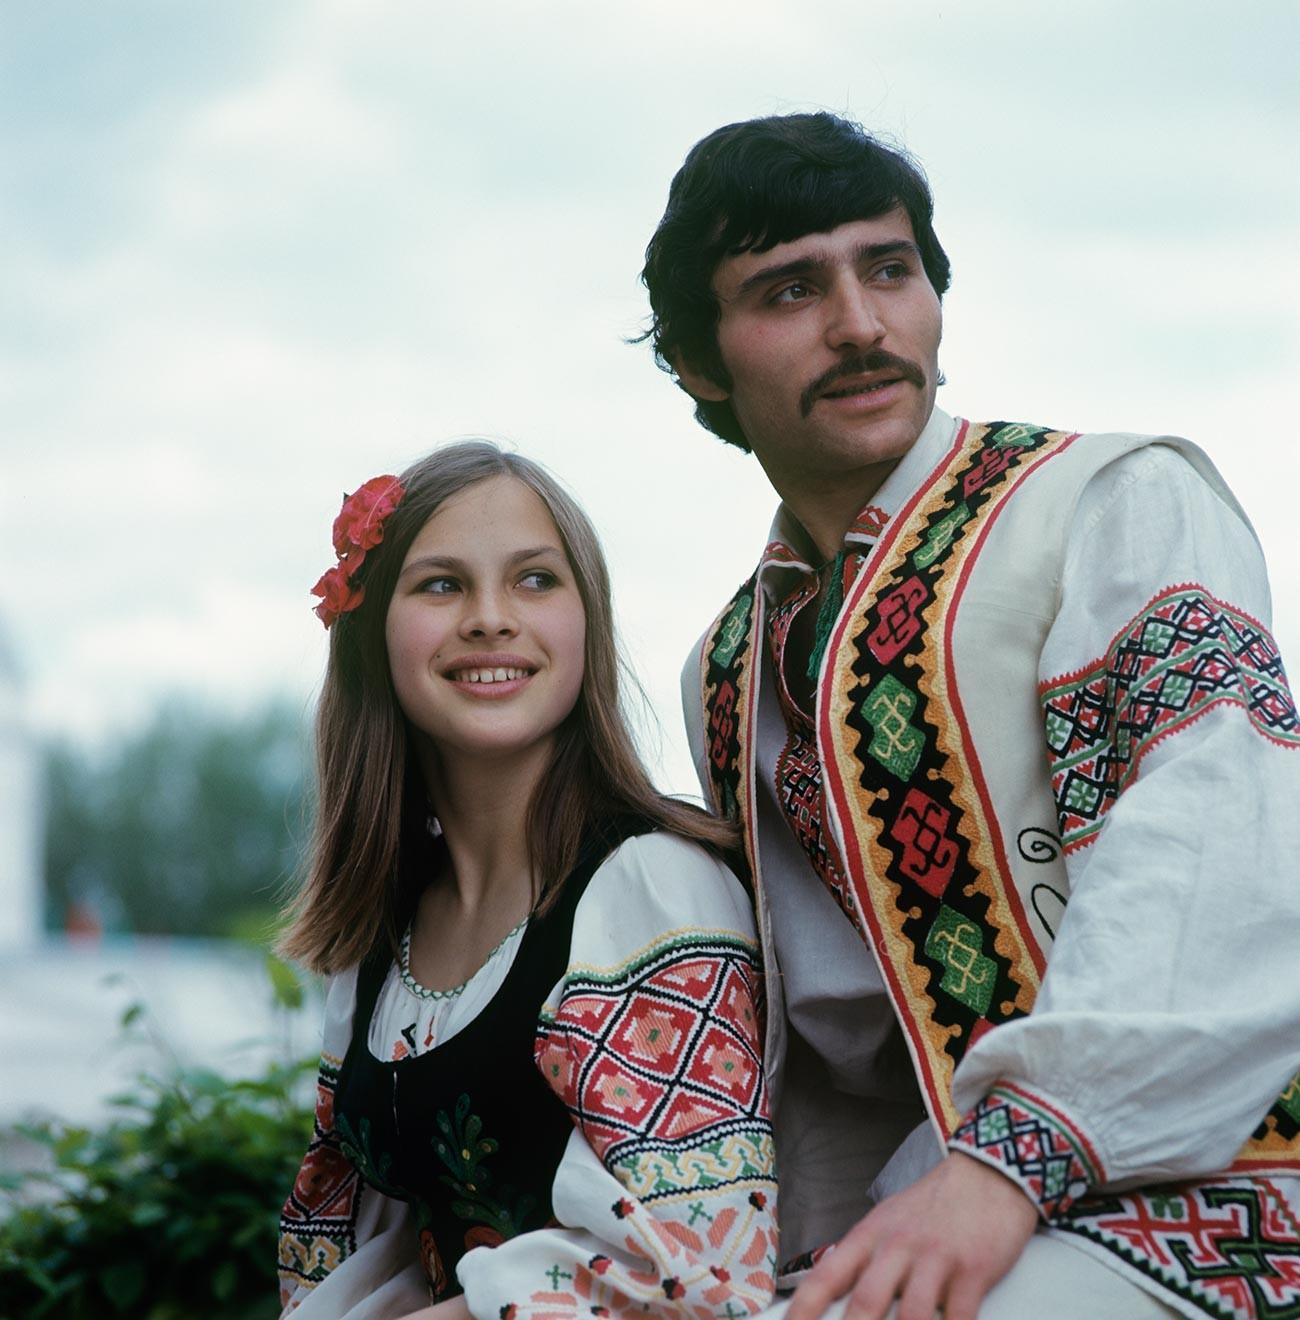 Members of the folk-dance ensemble Moldavanesca, 1975